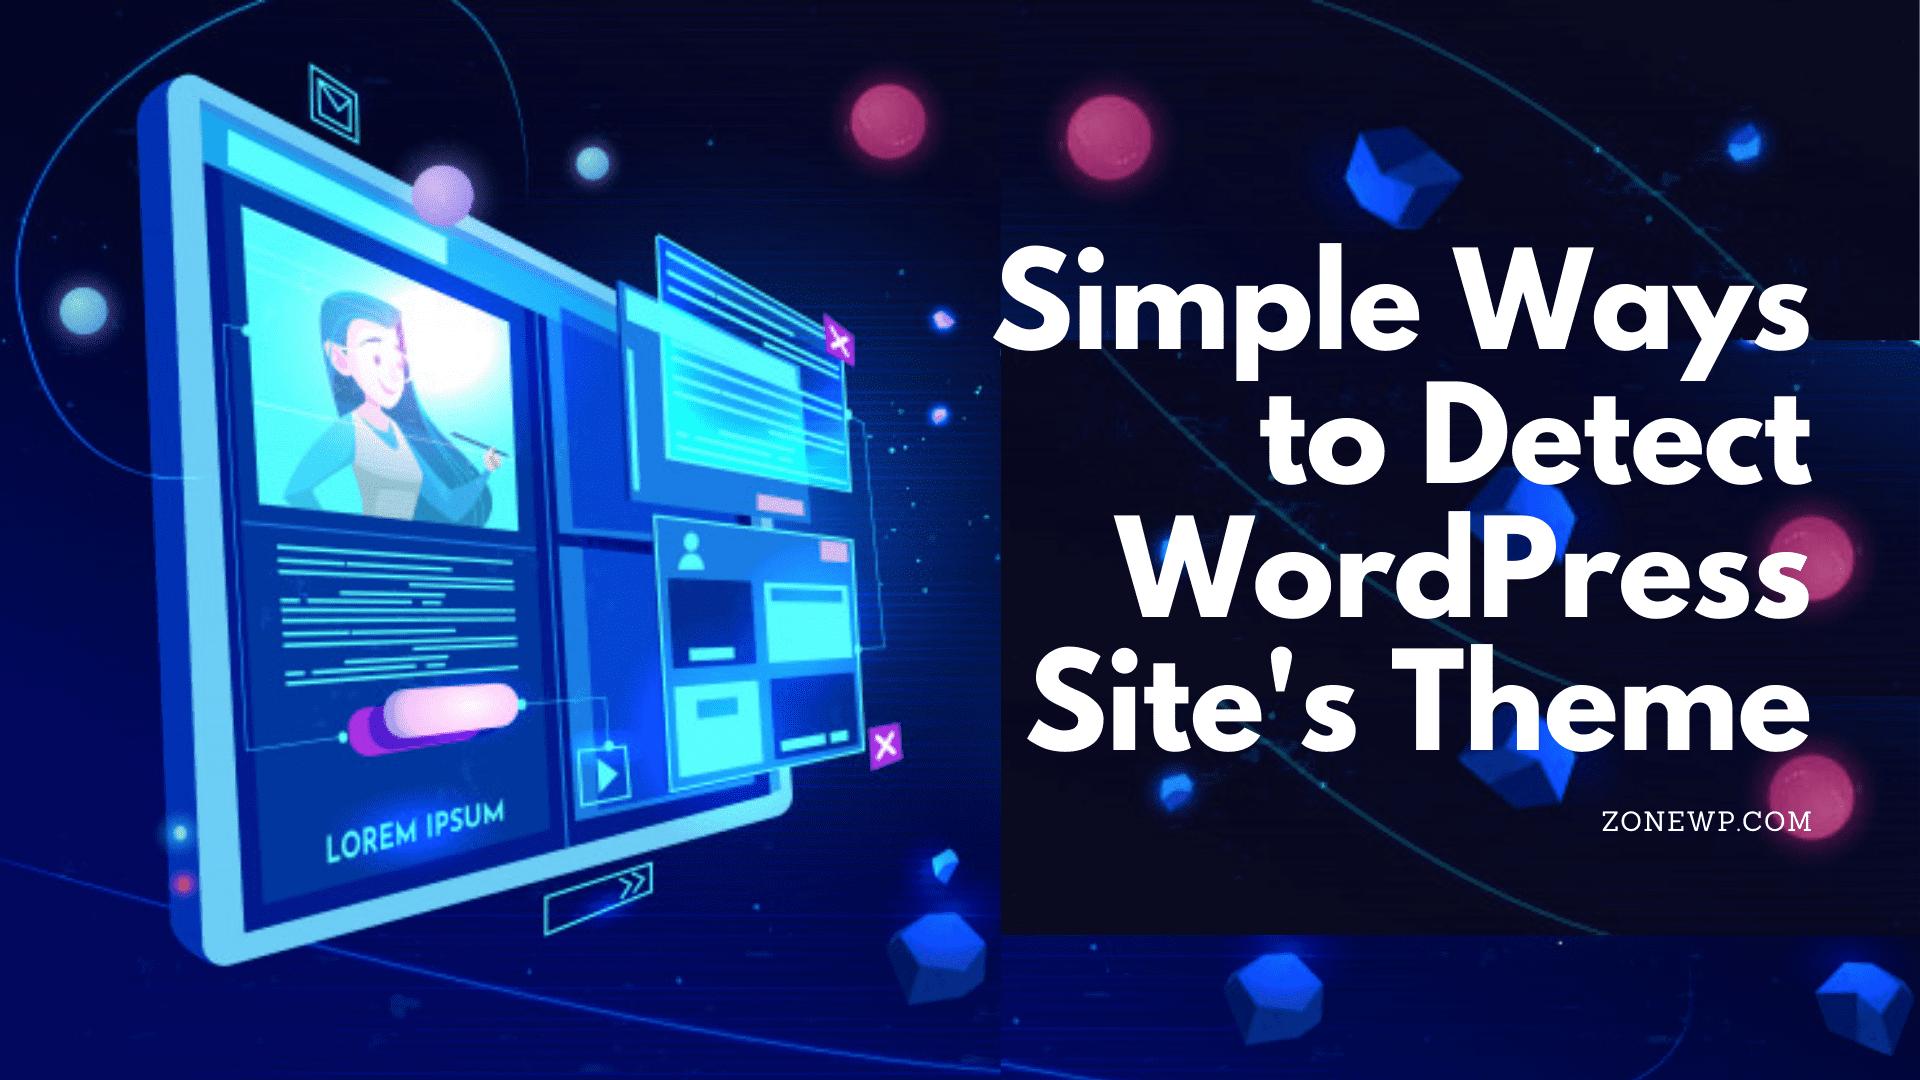 Simple Ways to Detect WordPress Site's Theme